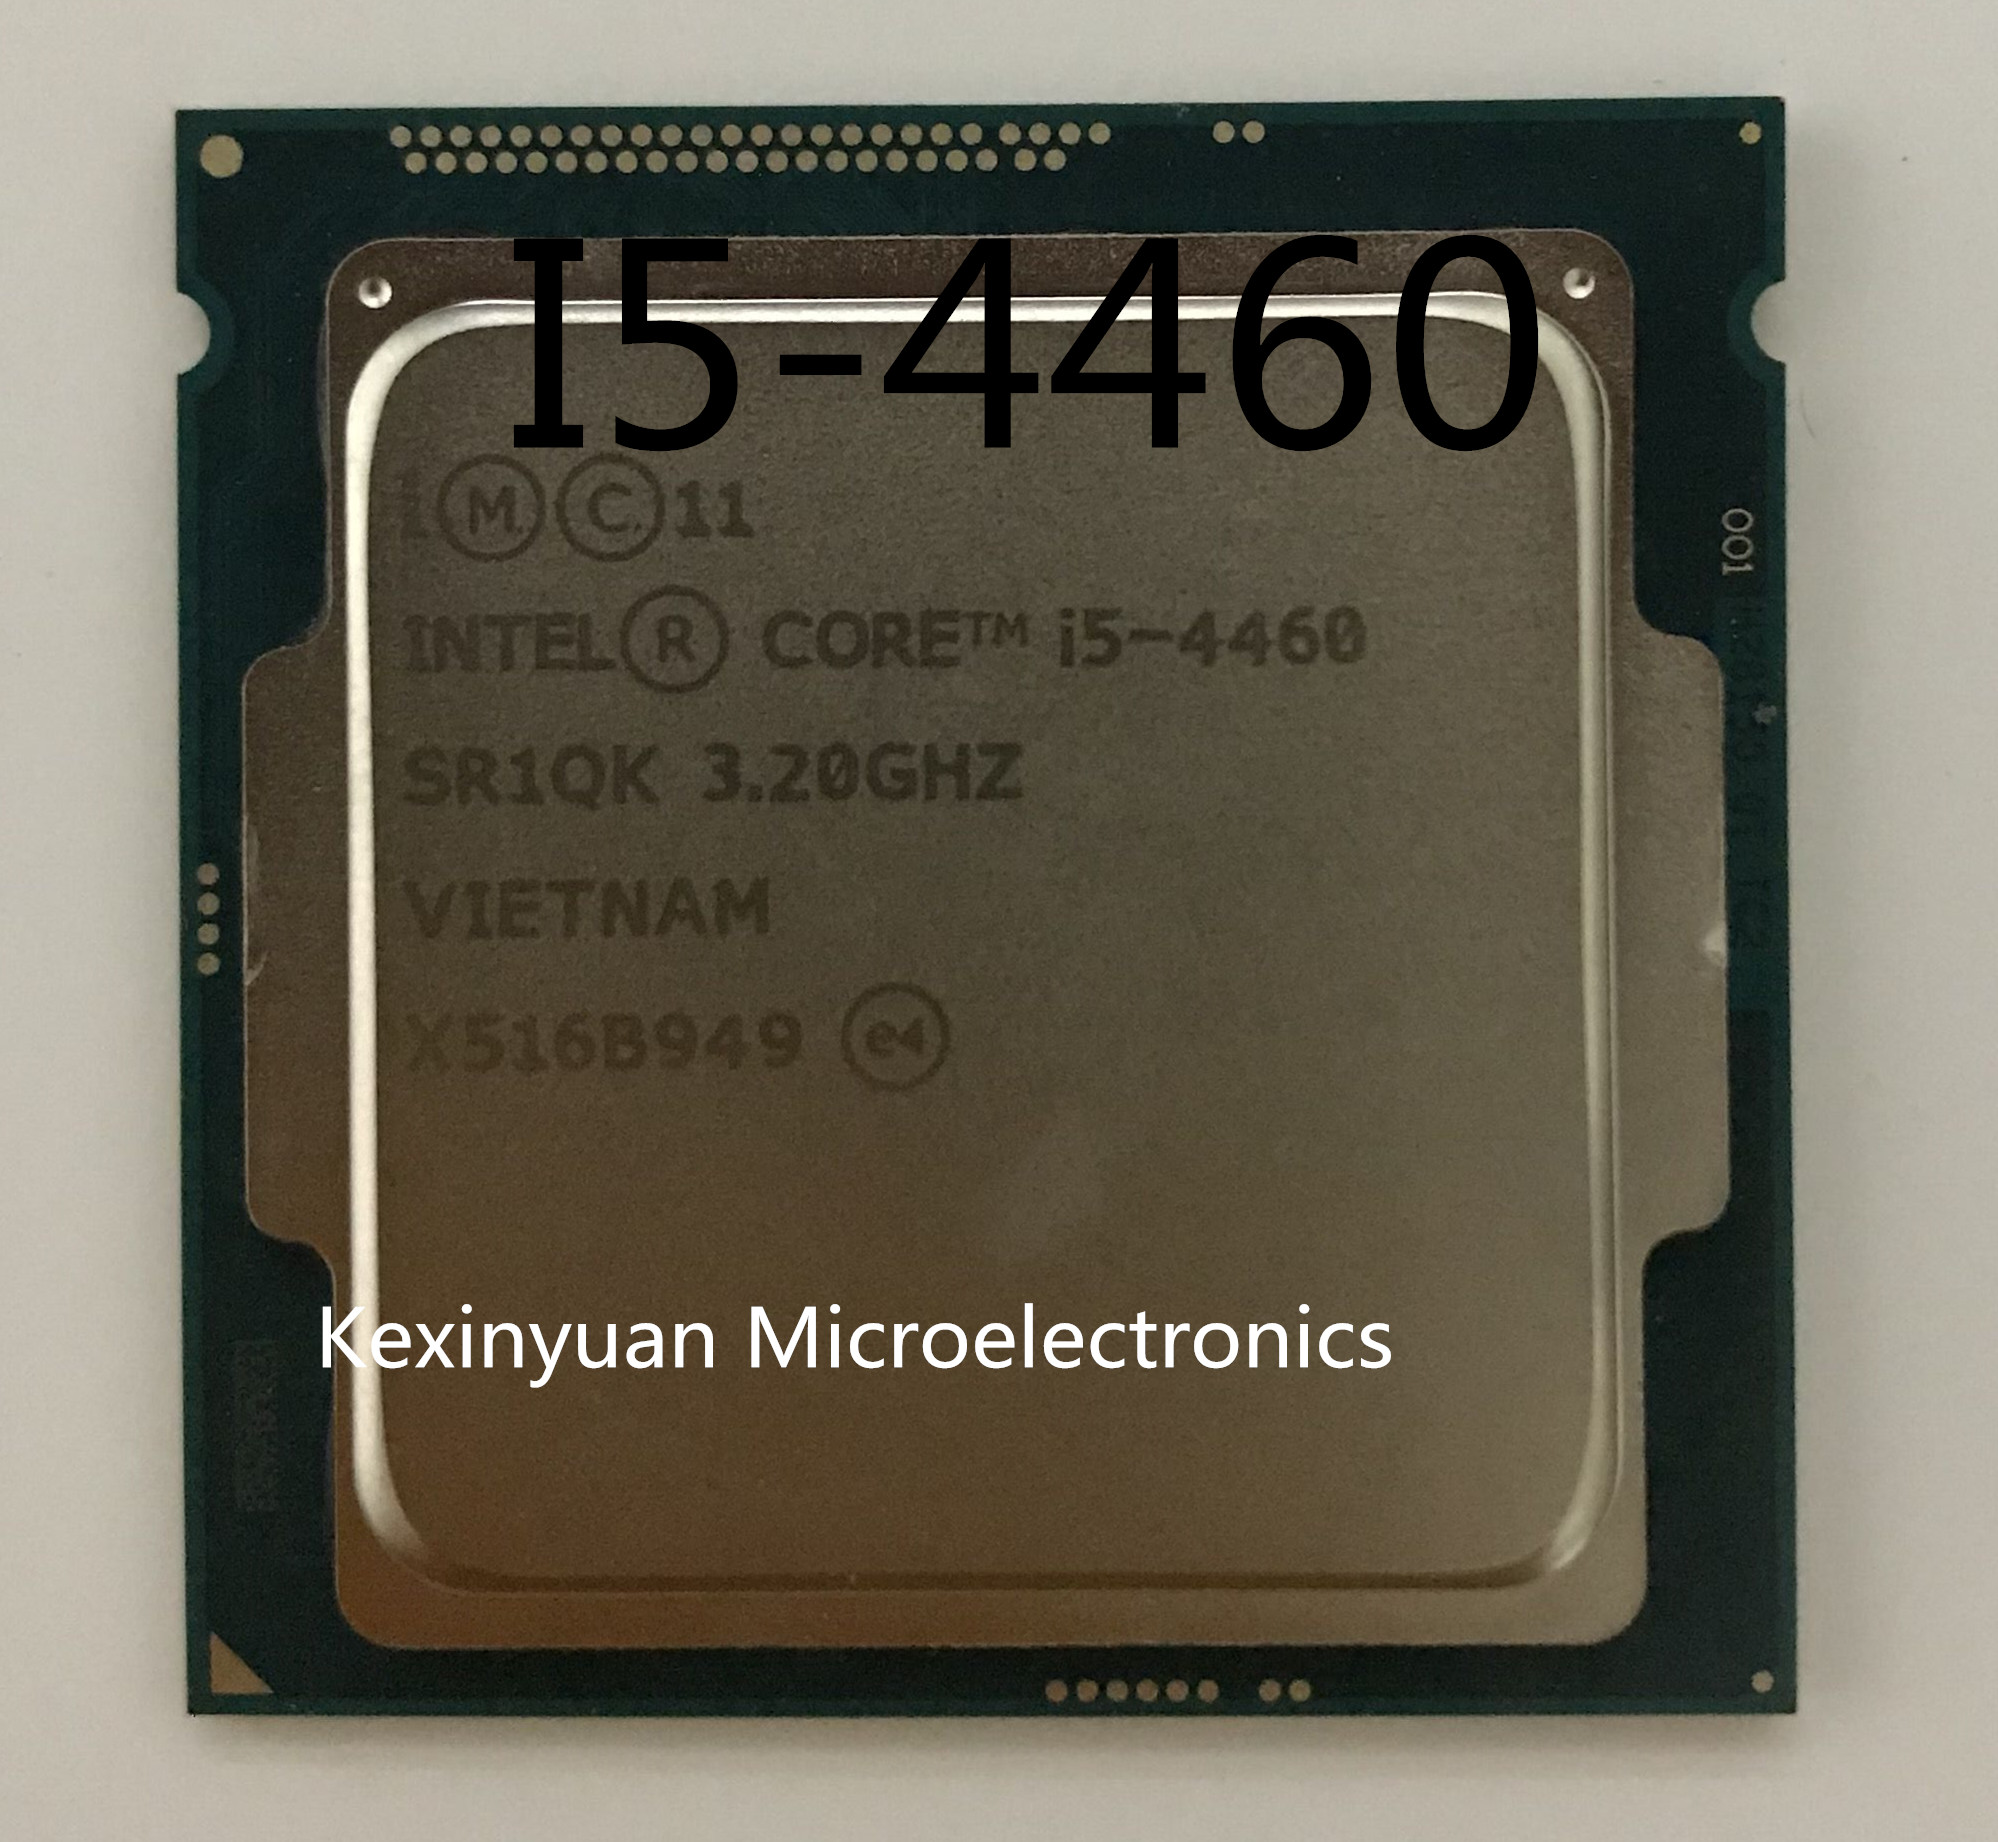 PC Computer Intel Core Processor I5 4460 I5-4460 LGA1150 22 Nanometers Dual-Core 100% Working Properly Desktop Processor